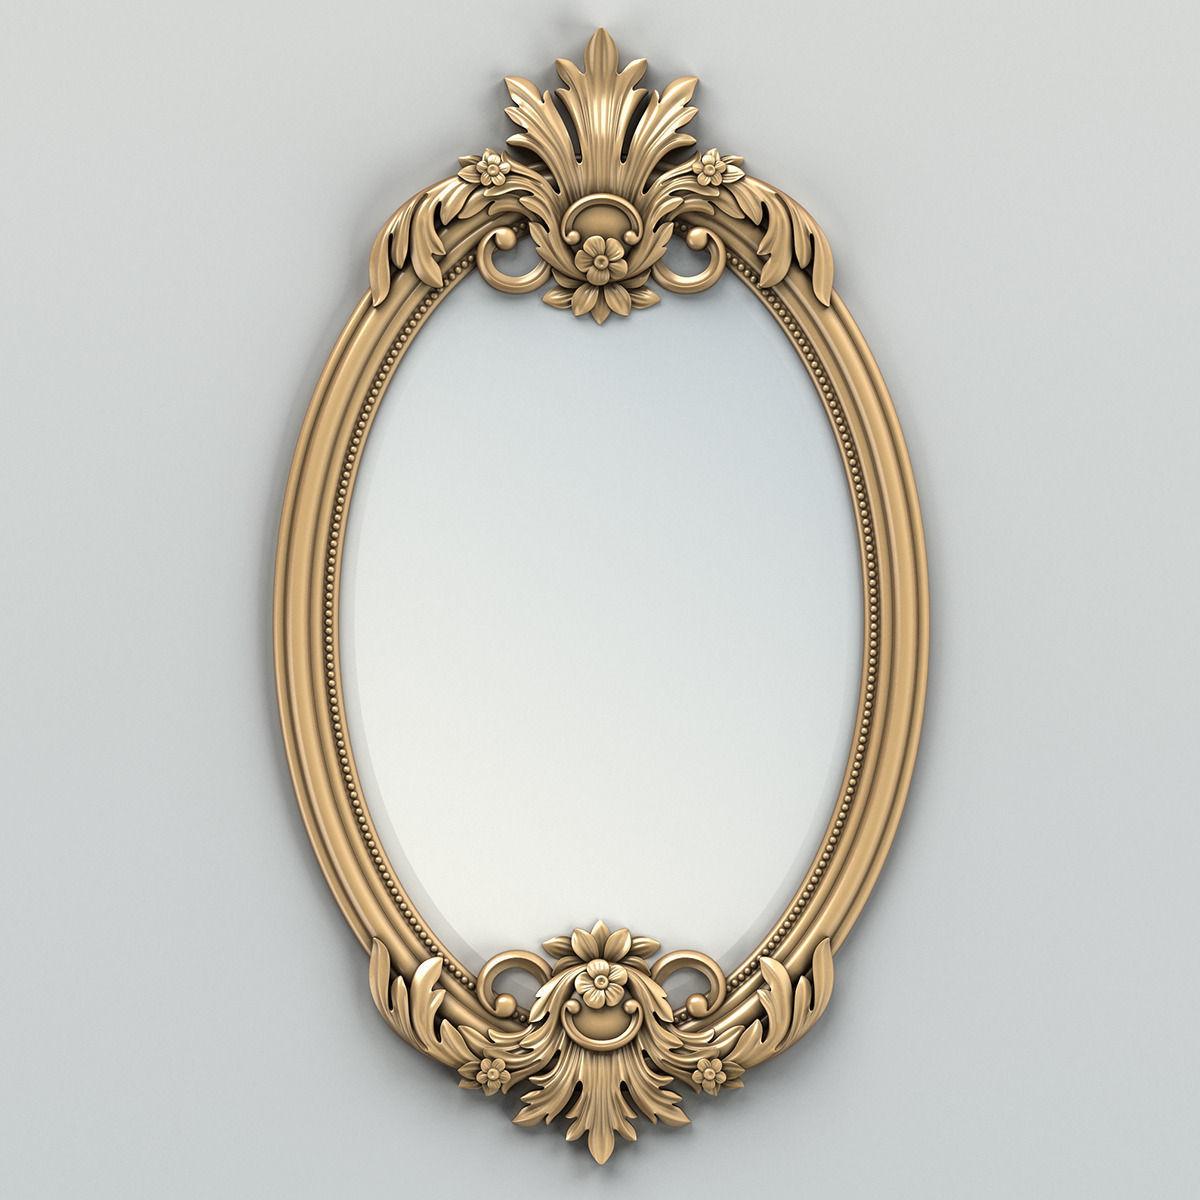 oval mirror frame 002 3d model max obj fbx stl 2 - Mirror Picture Frame